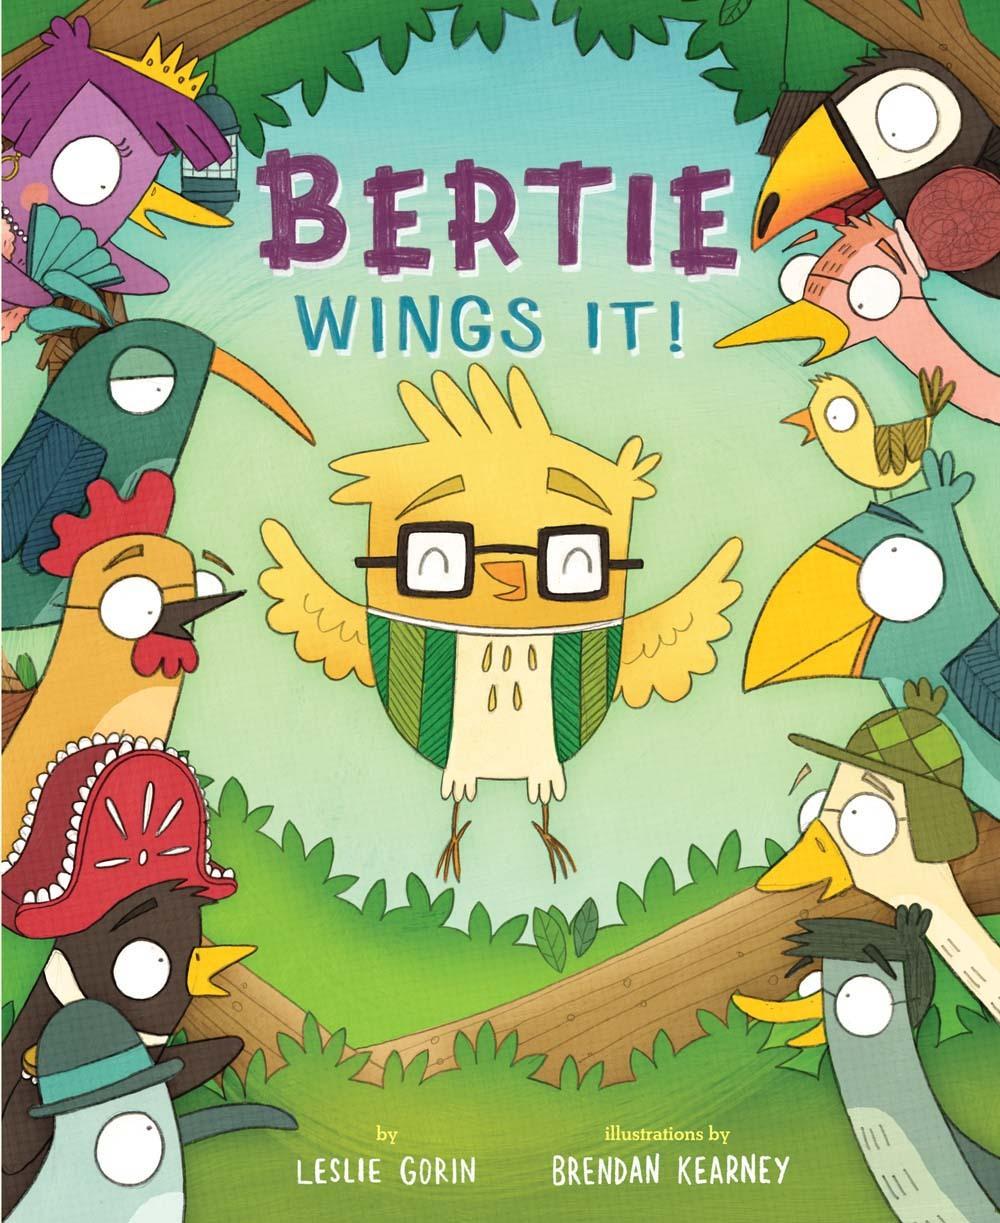 Bertie Wings It! Leslie Gorin